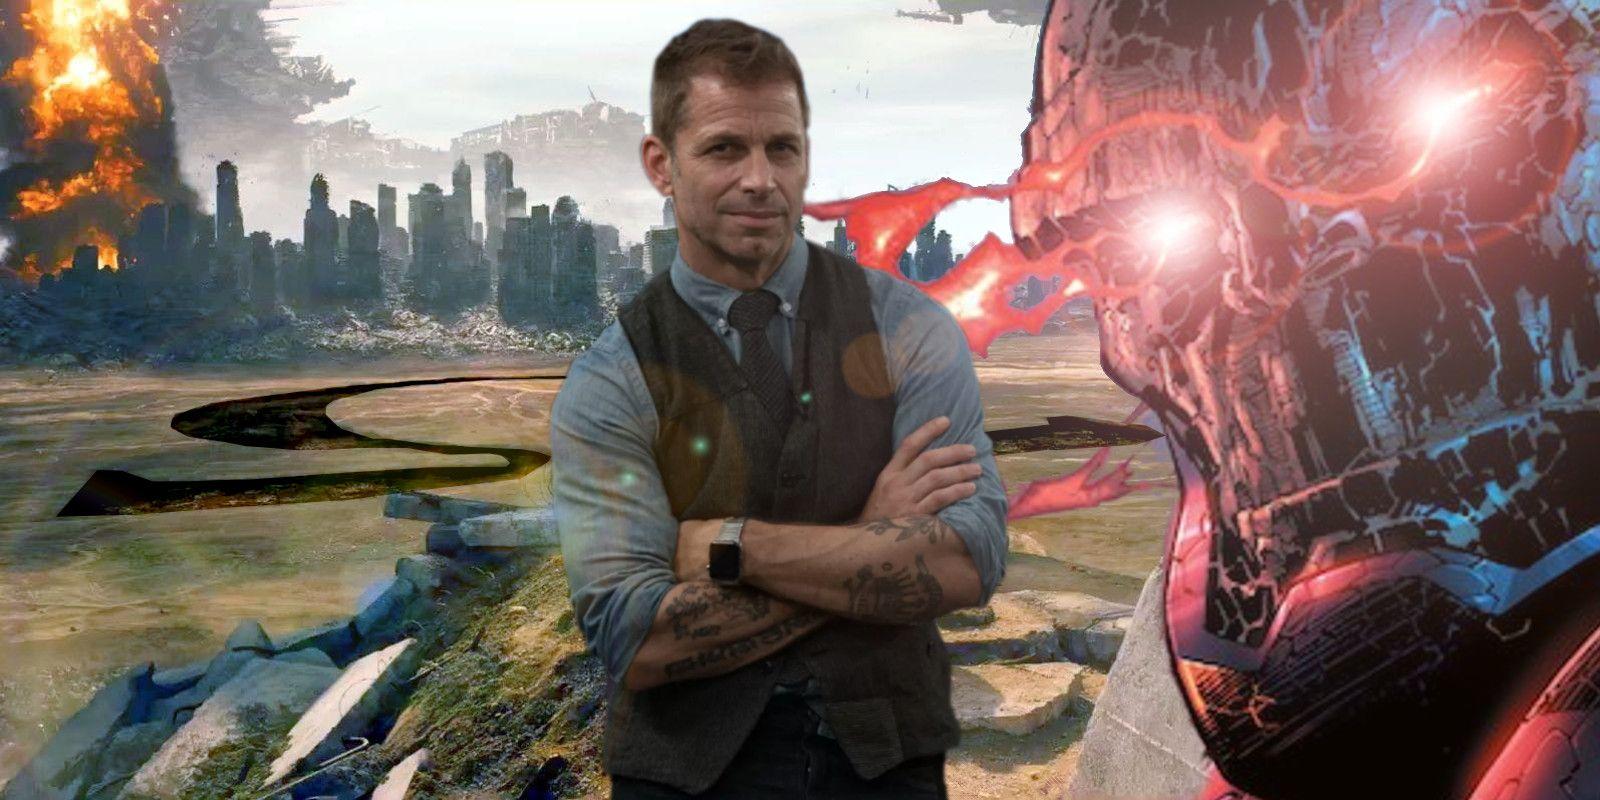 Justice League Cut Darkseid Scene Art Revealed | ScreenRant